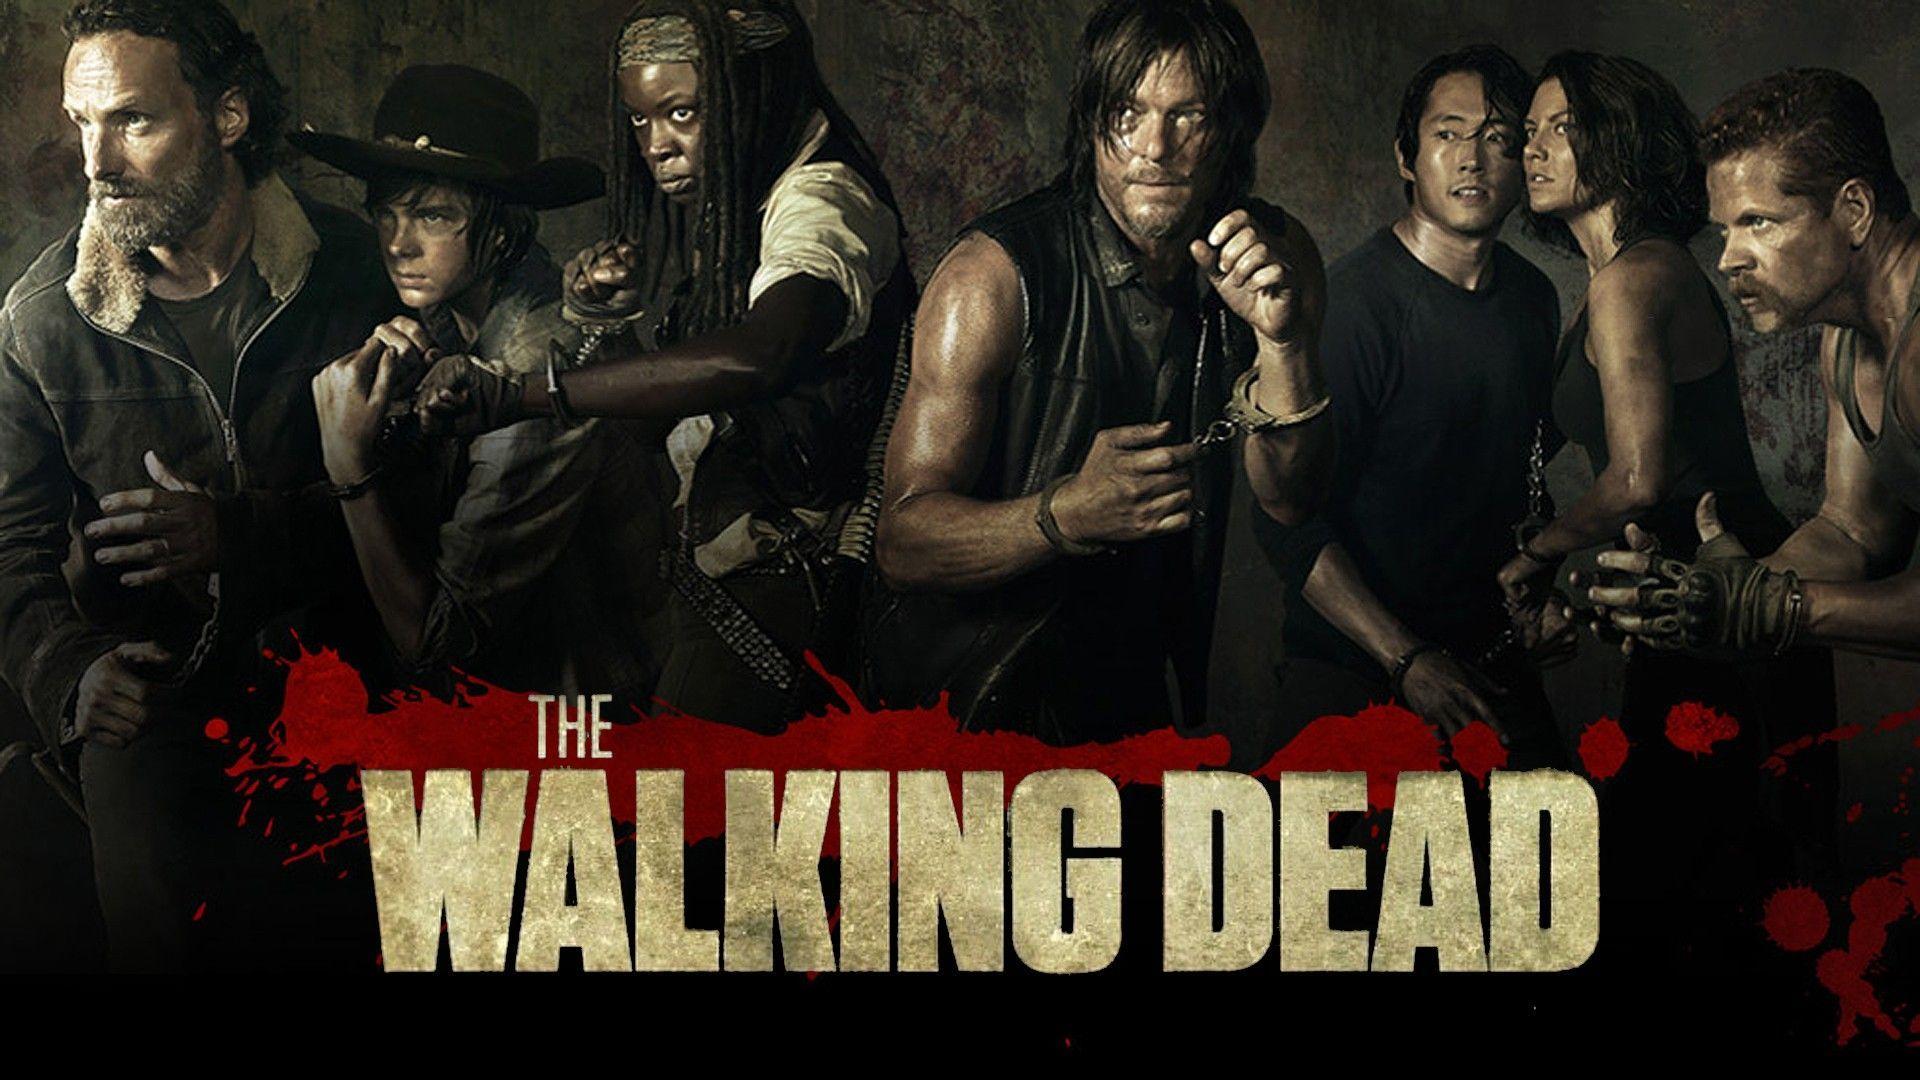 7445 - Personajes de la serie The Walking Dead. Nivel Fácil